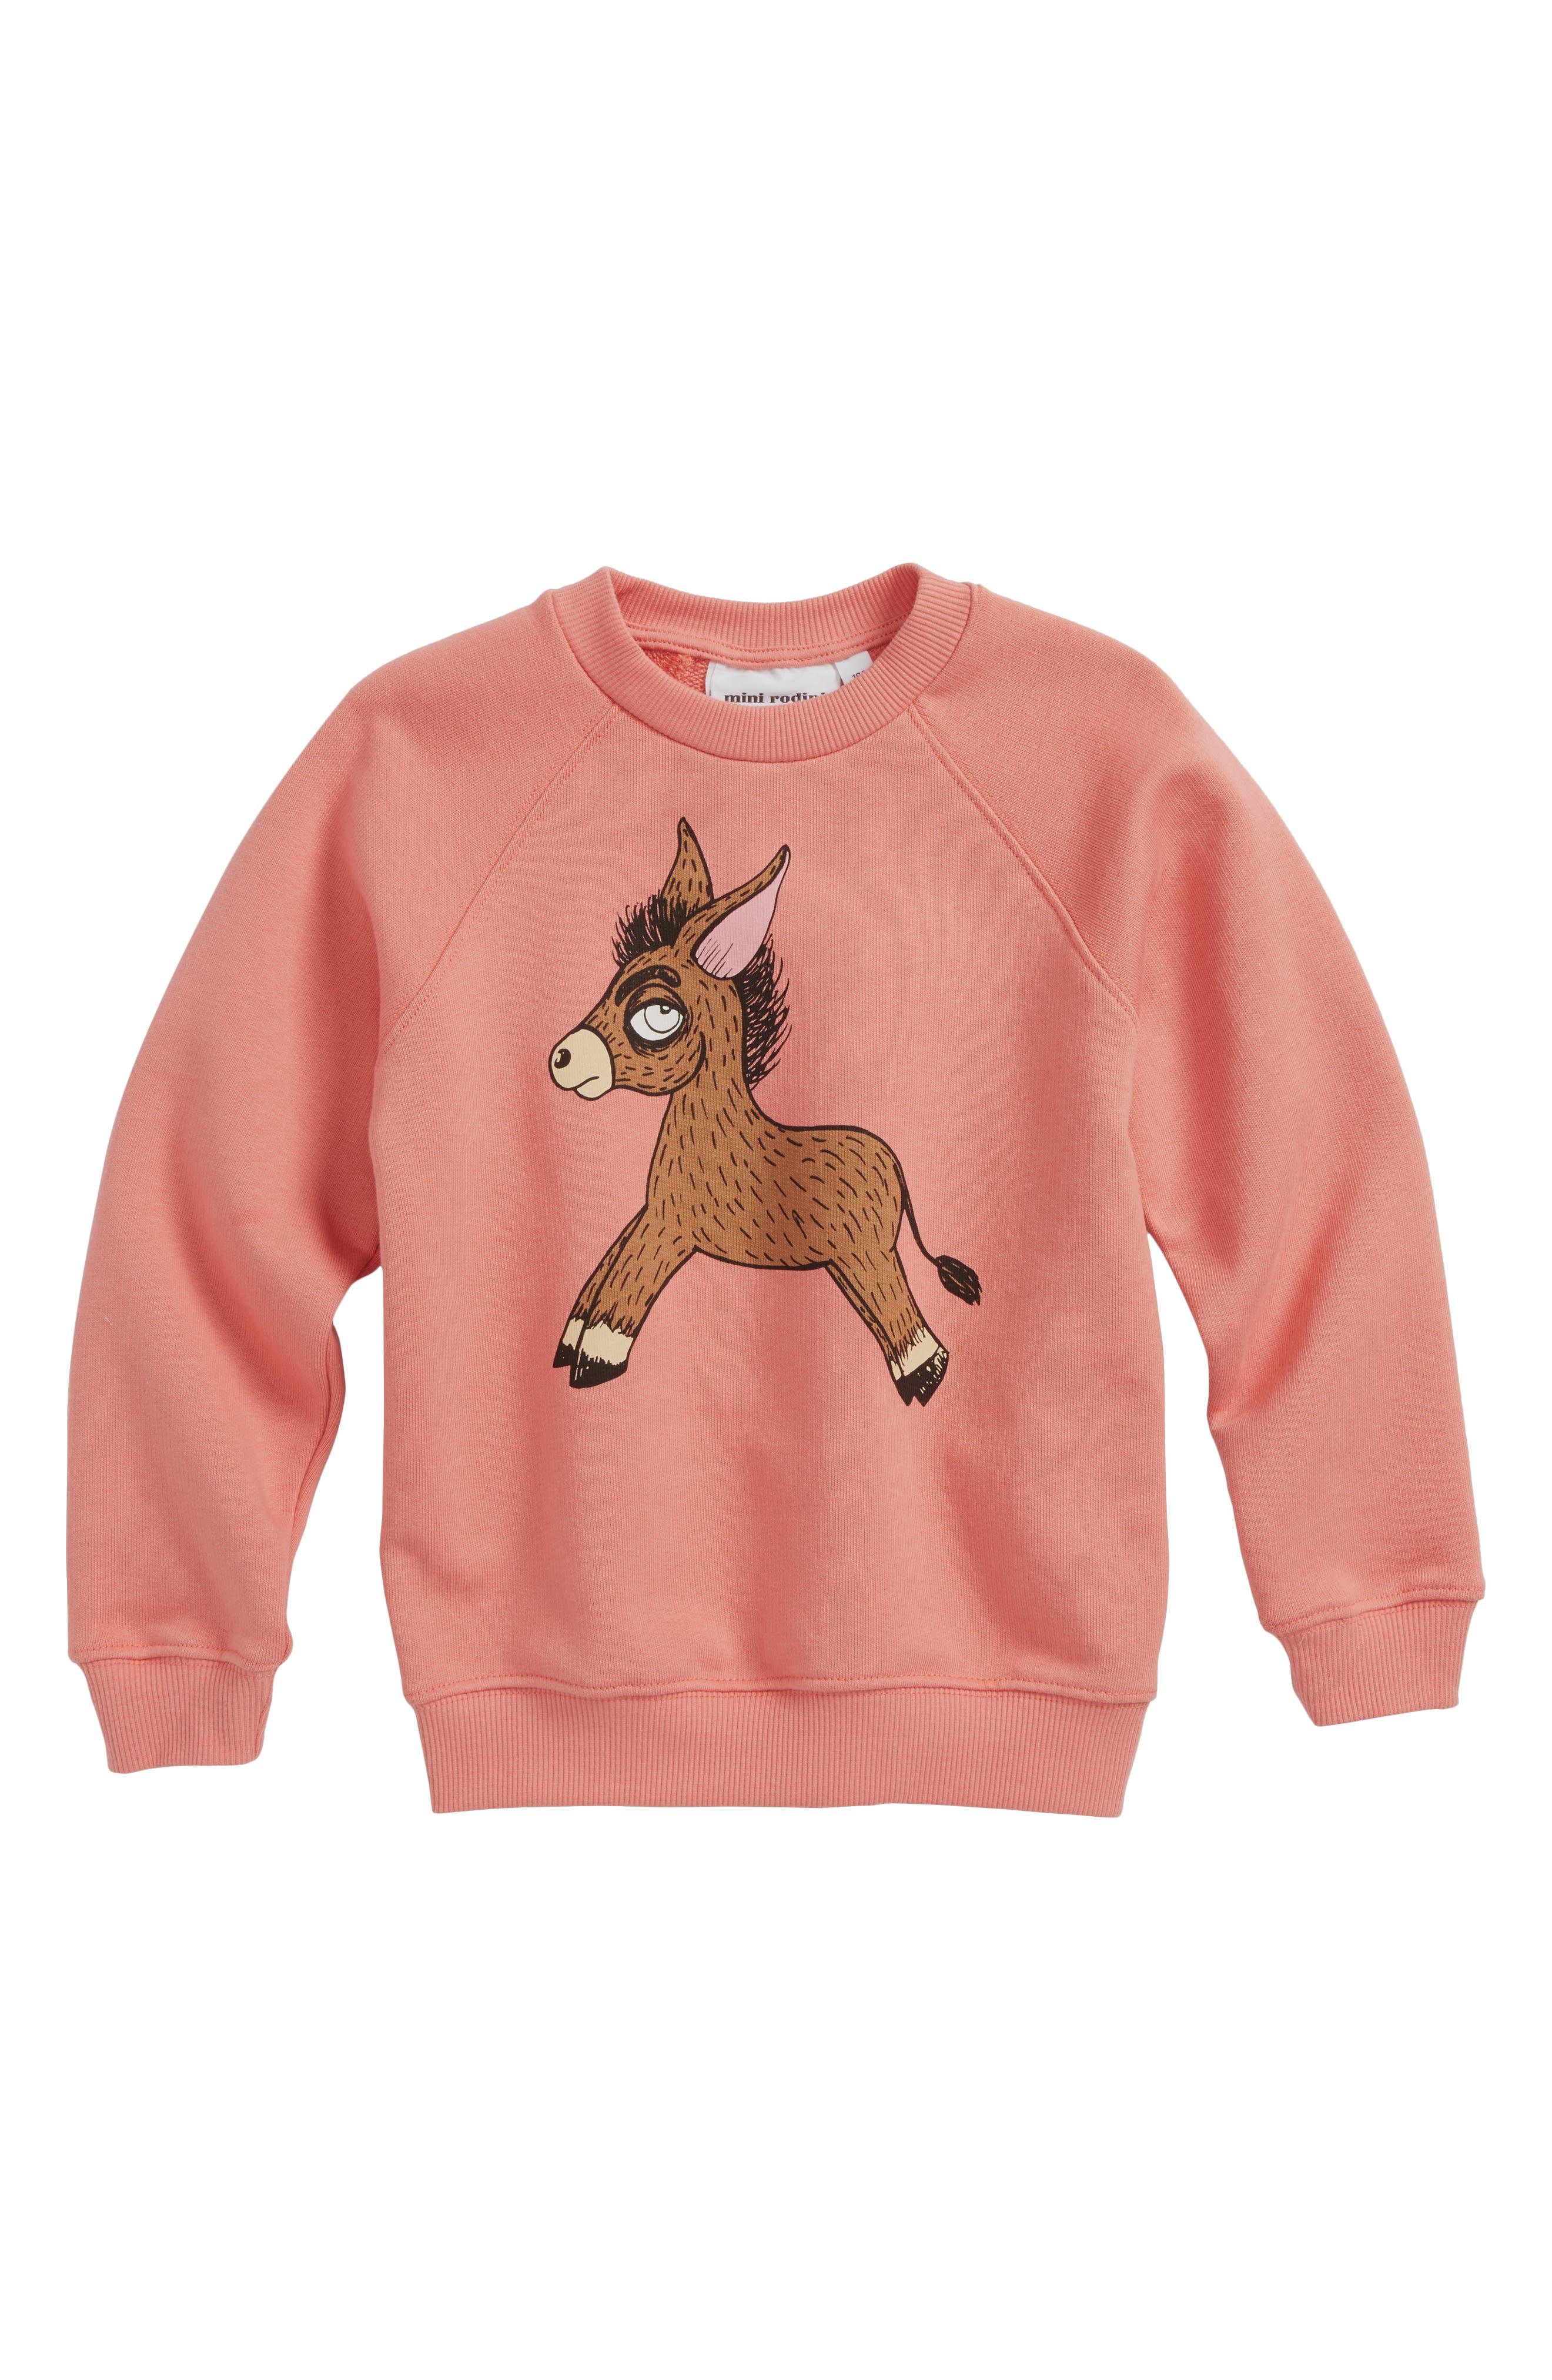 Donkey Organic Cotton Sweatshirt,                         Main,                         color, Pink